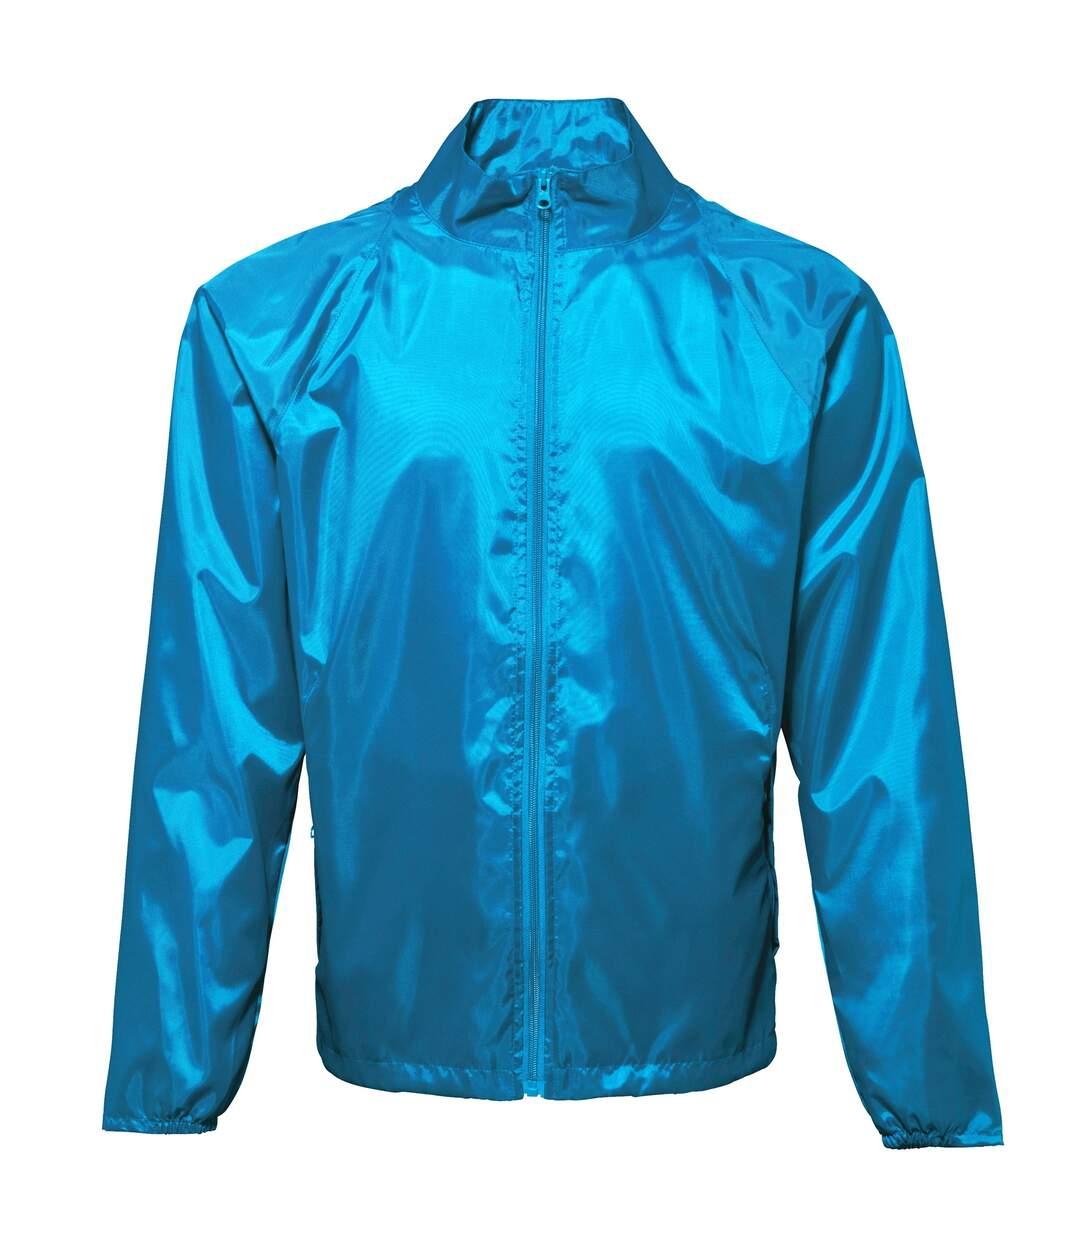 2786 Unisex Lightweight Plain Wind & Shower Resistant Jacket (Sapphire) - UTRW2500